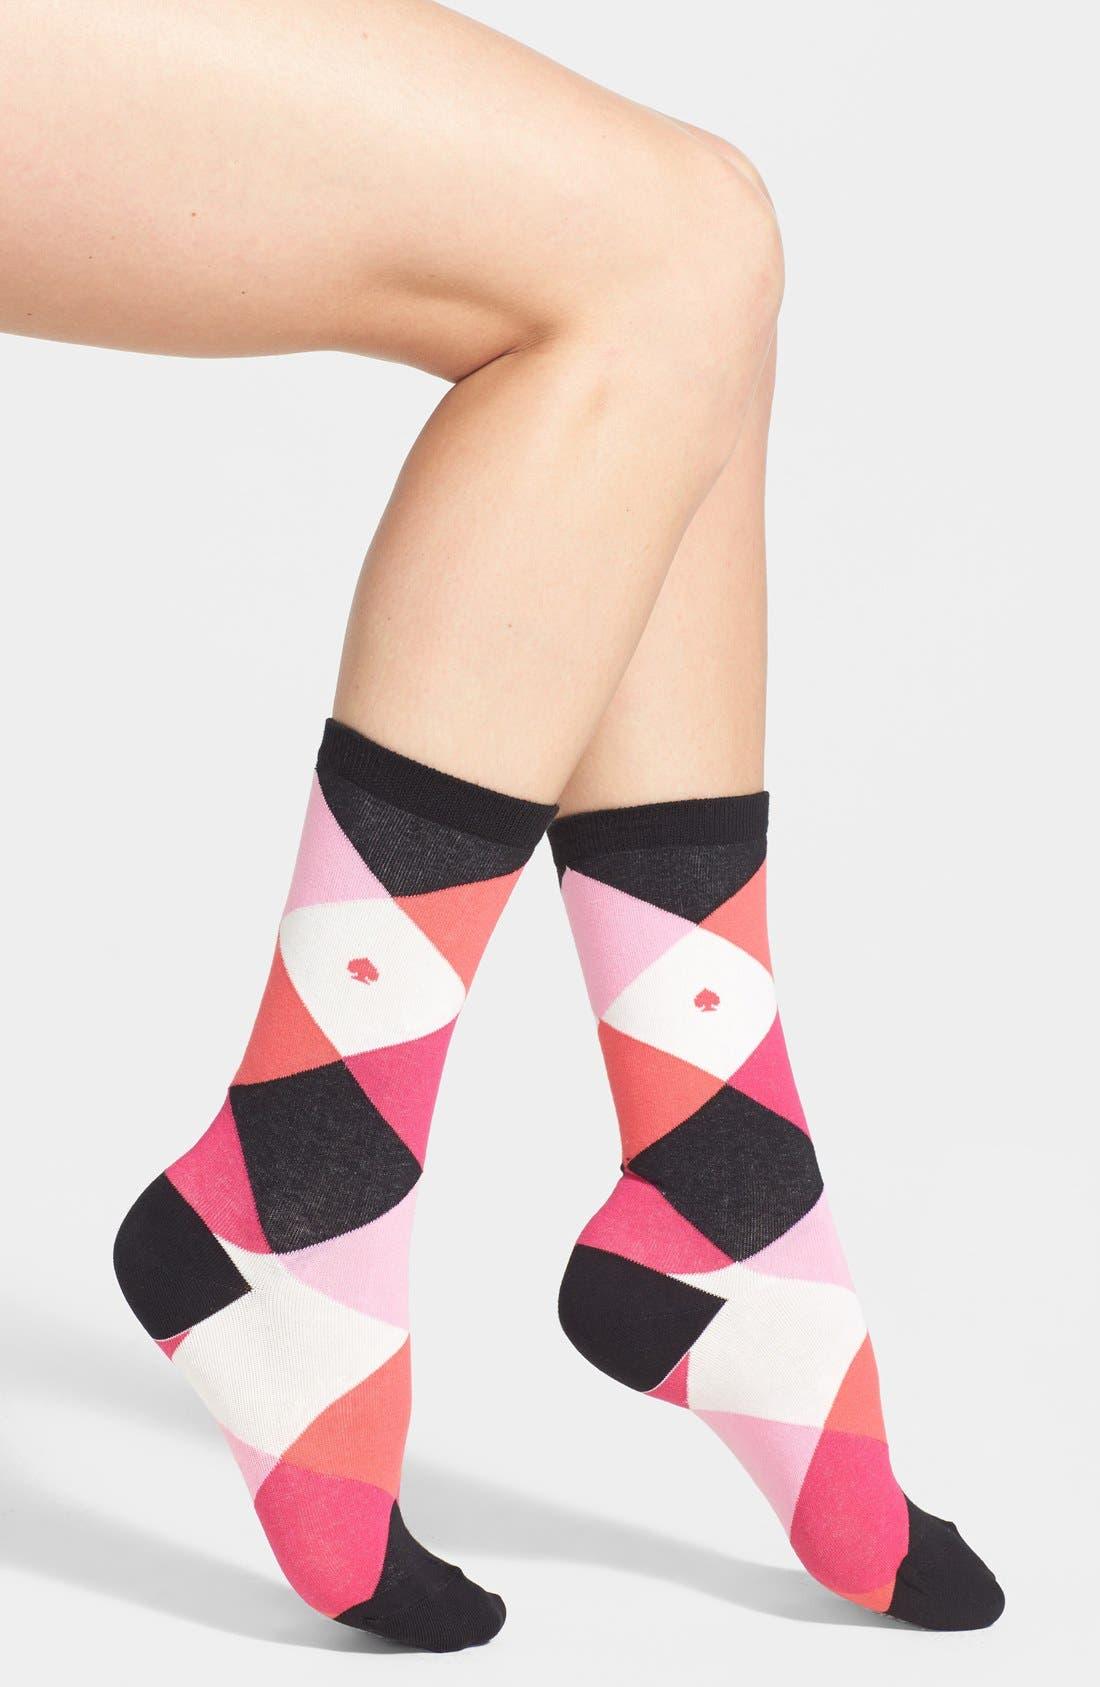 Main Image - kate spade new york 'harlequin' crew socks (2 for $18)